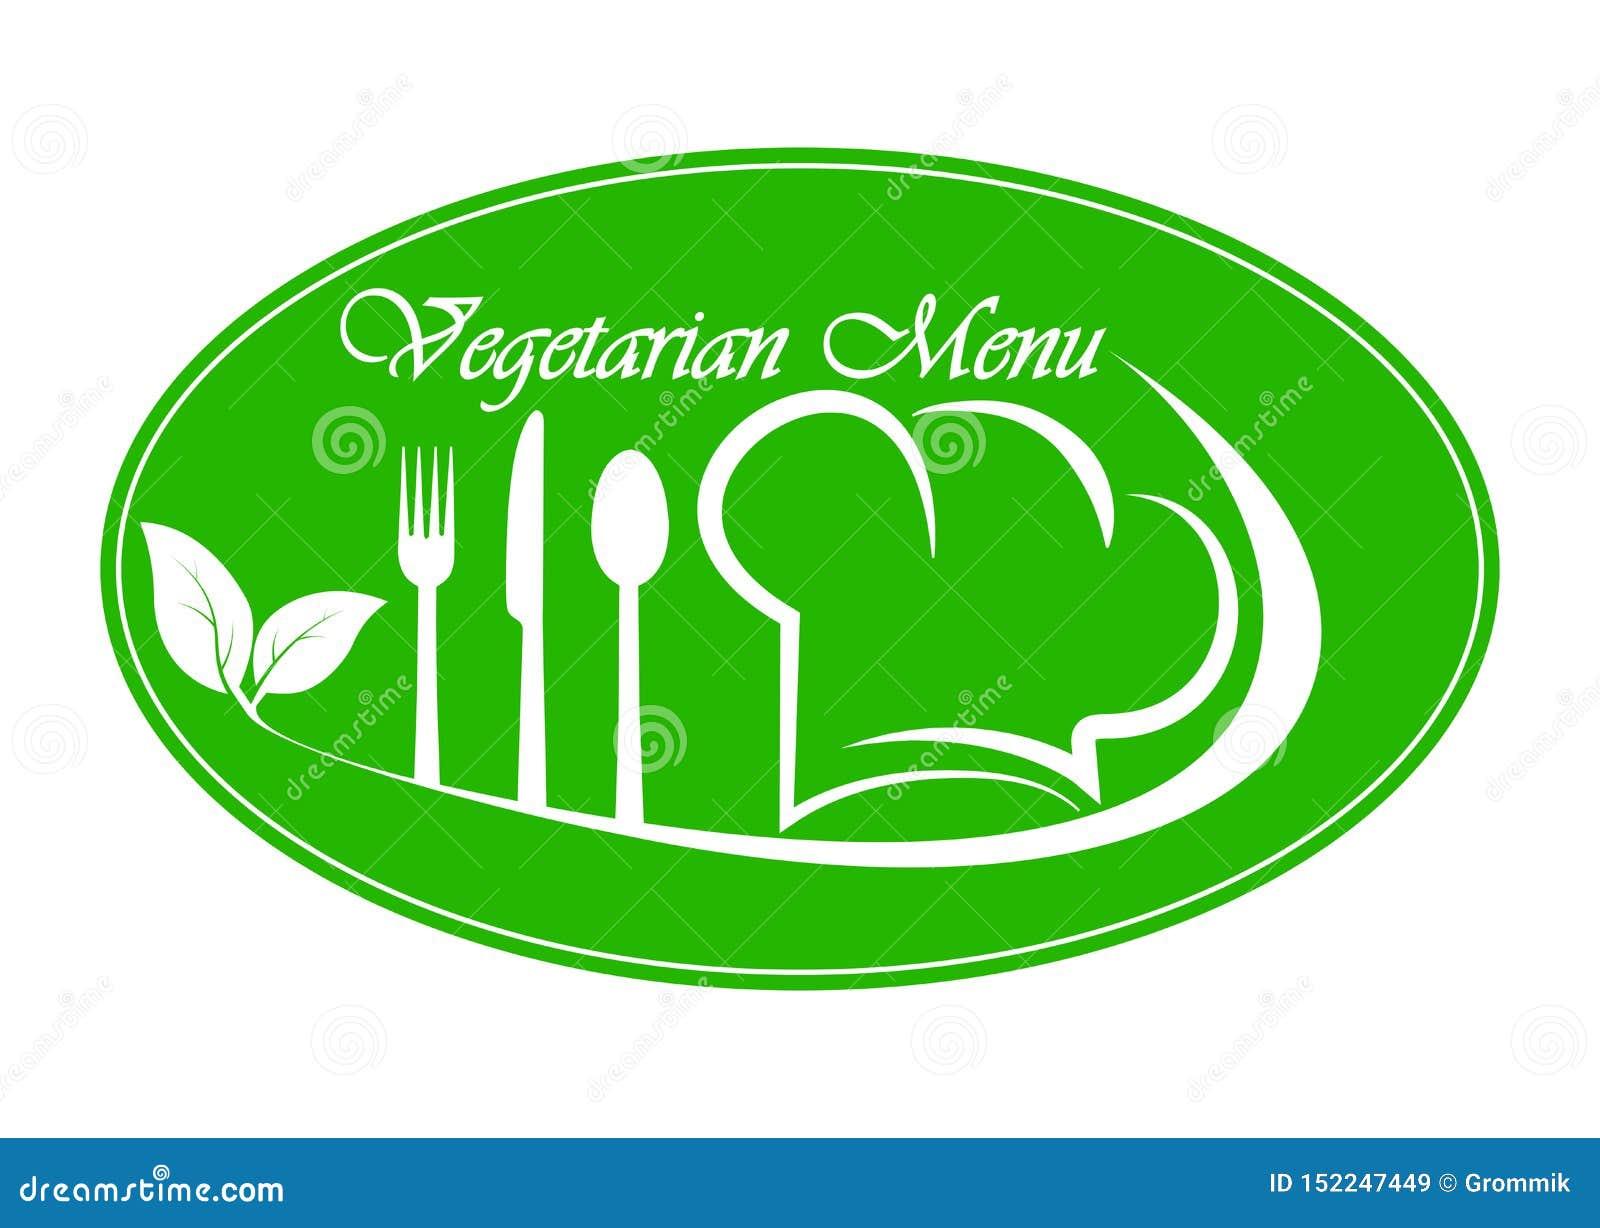 Logo for restaurant, catering or gastro service Vegetarian menu design